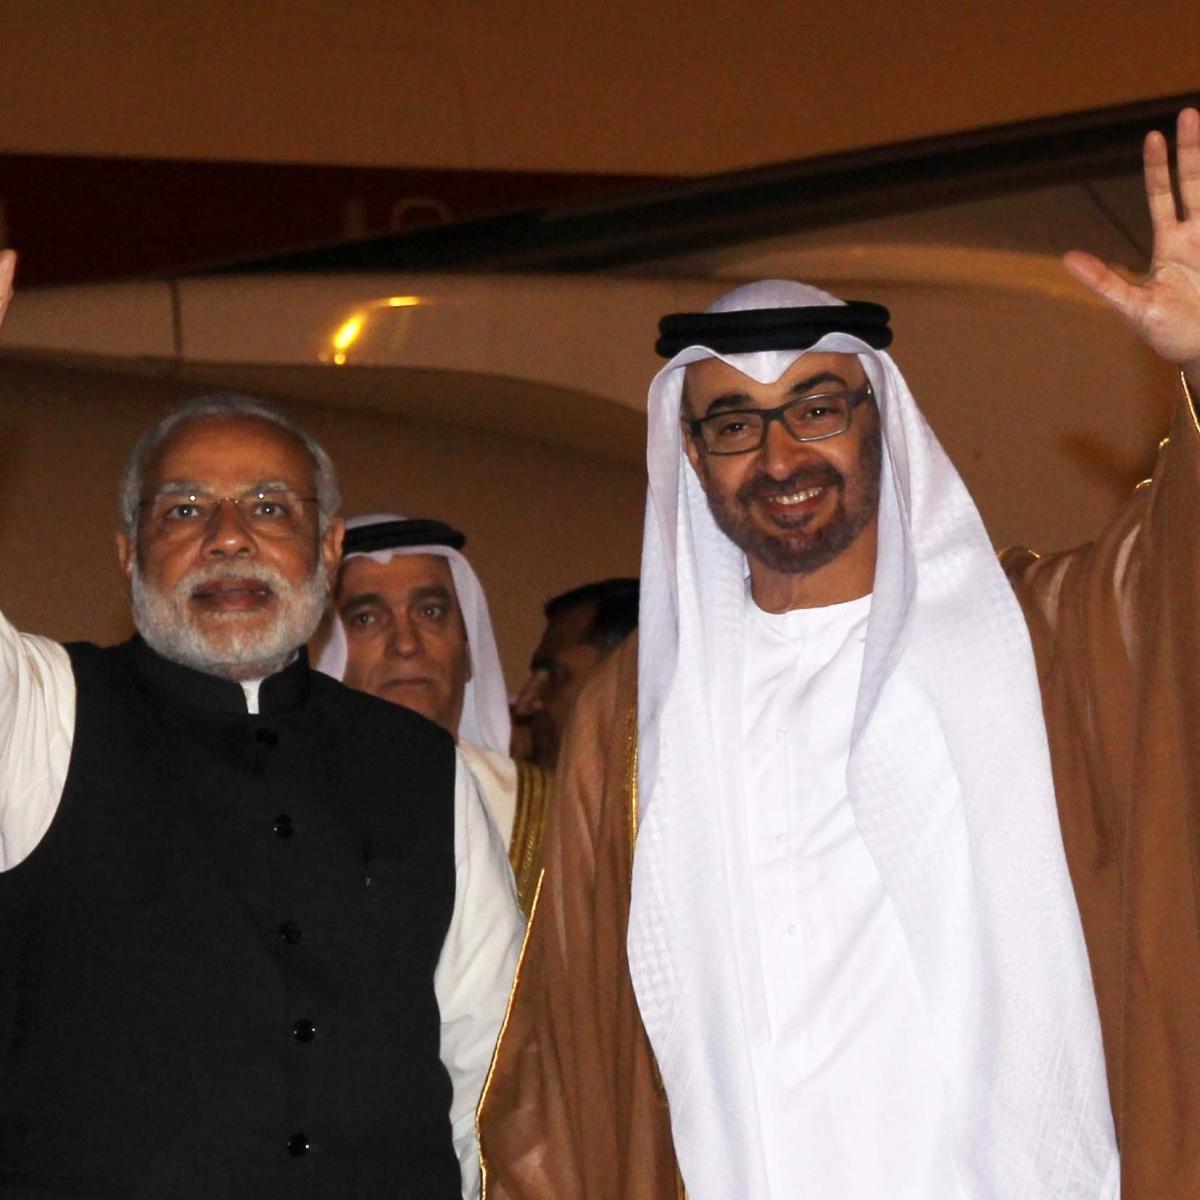 After UAE royal slams Islamophobic man, Indian Ambassador tweets to warn Indian nationals against discrimination